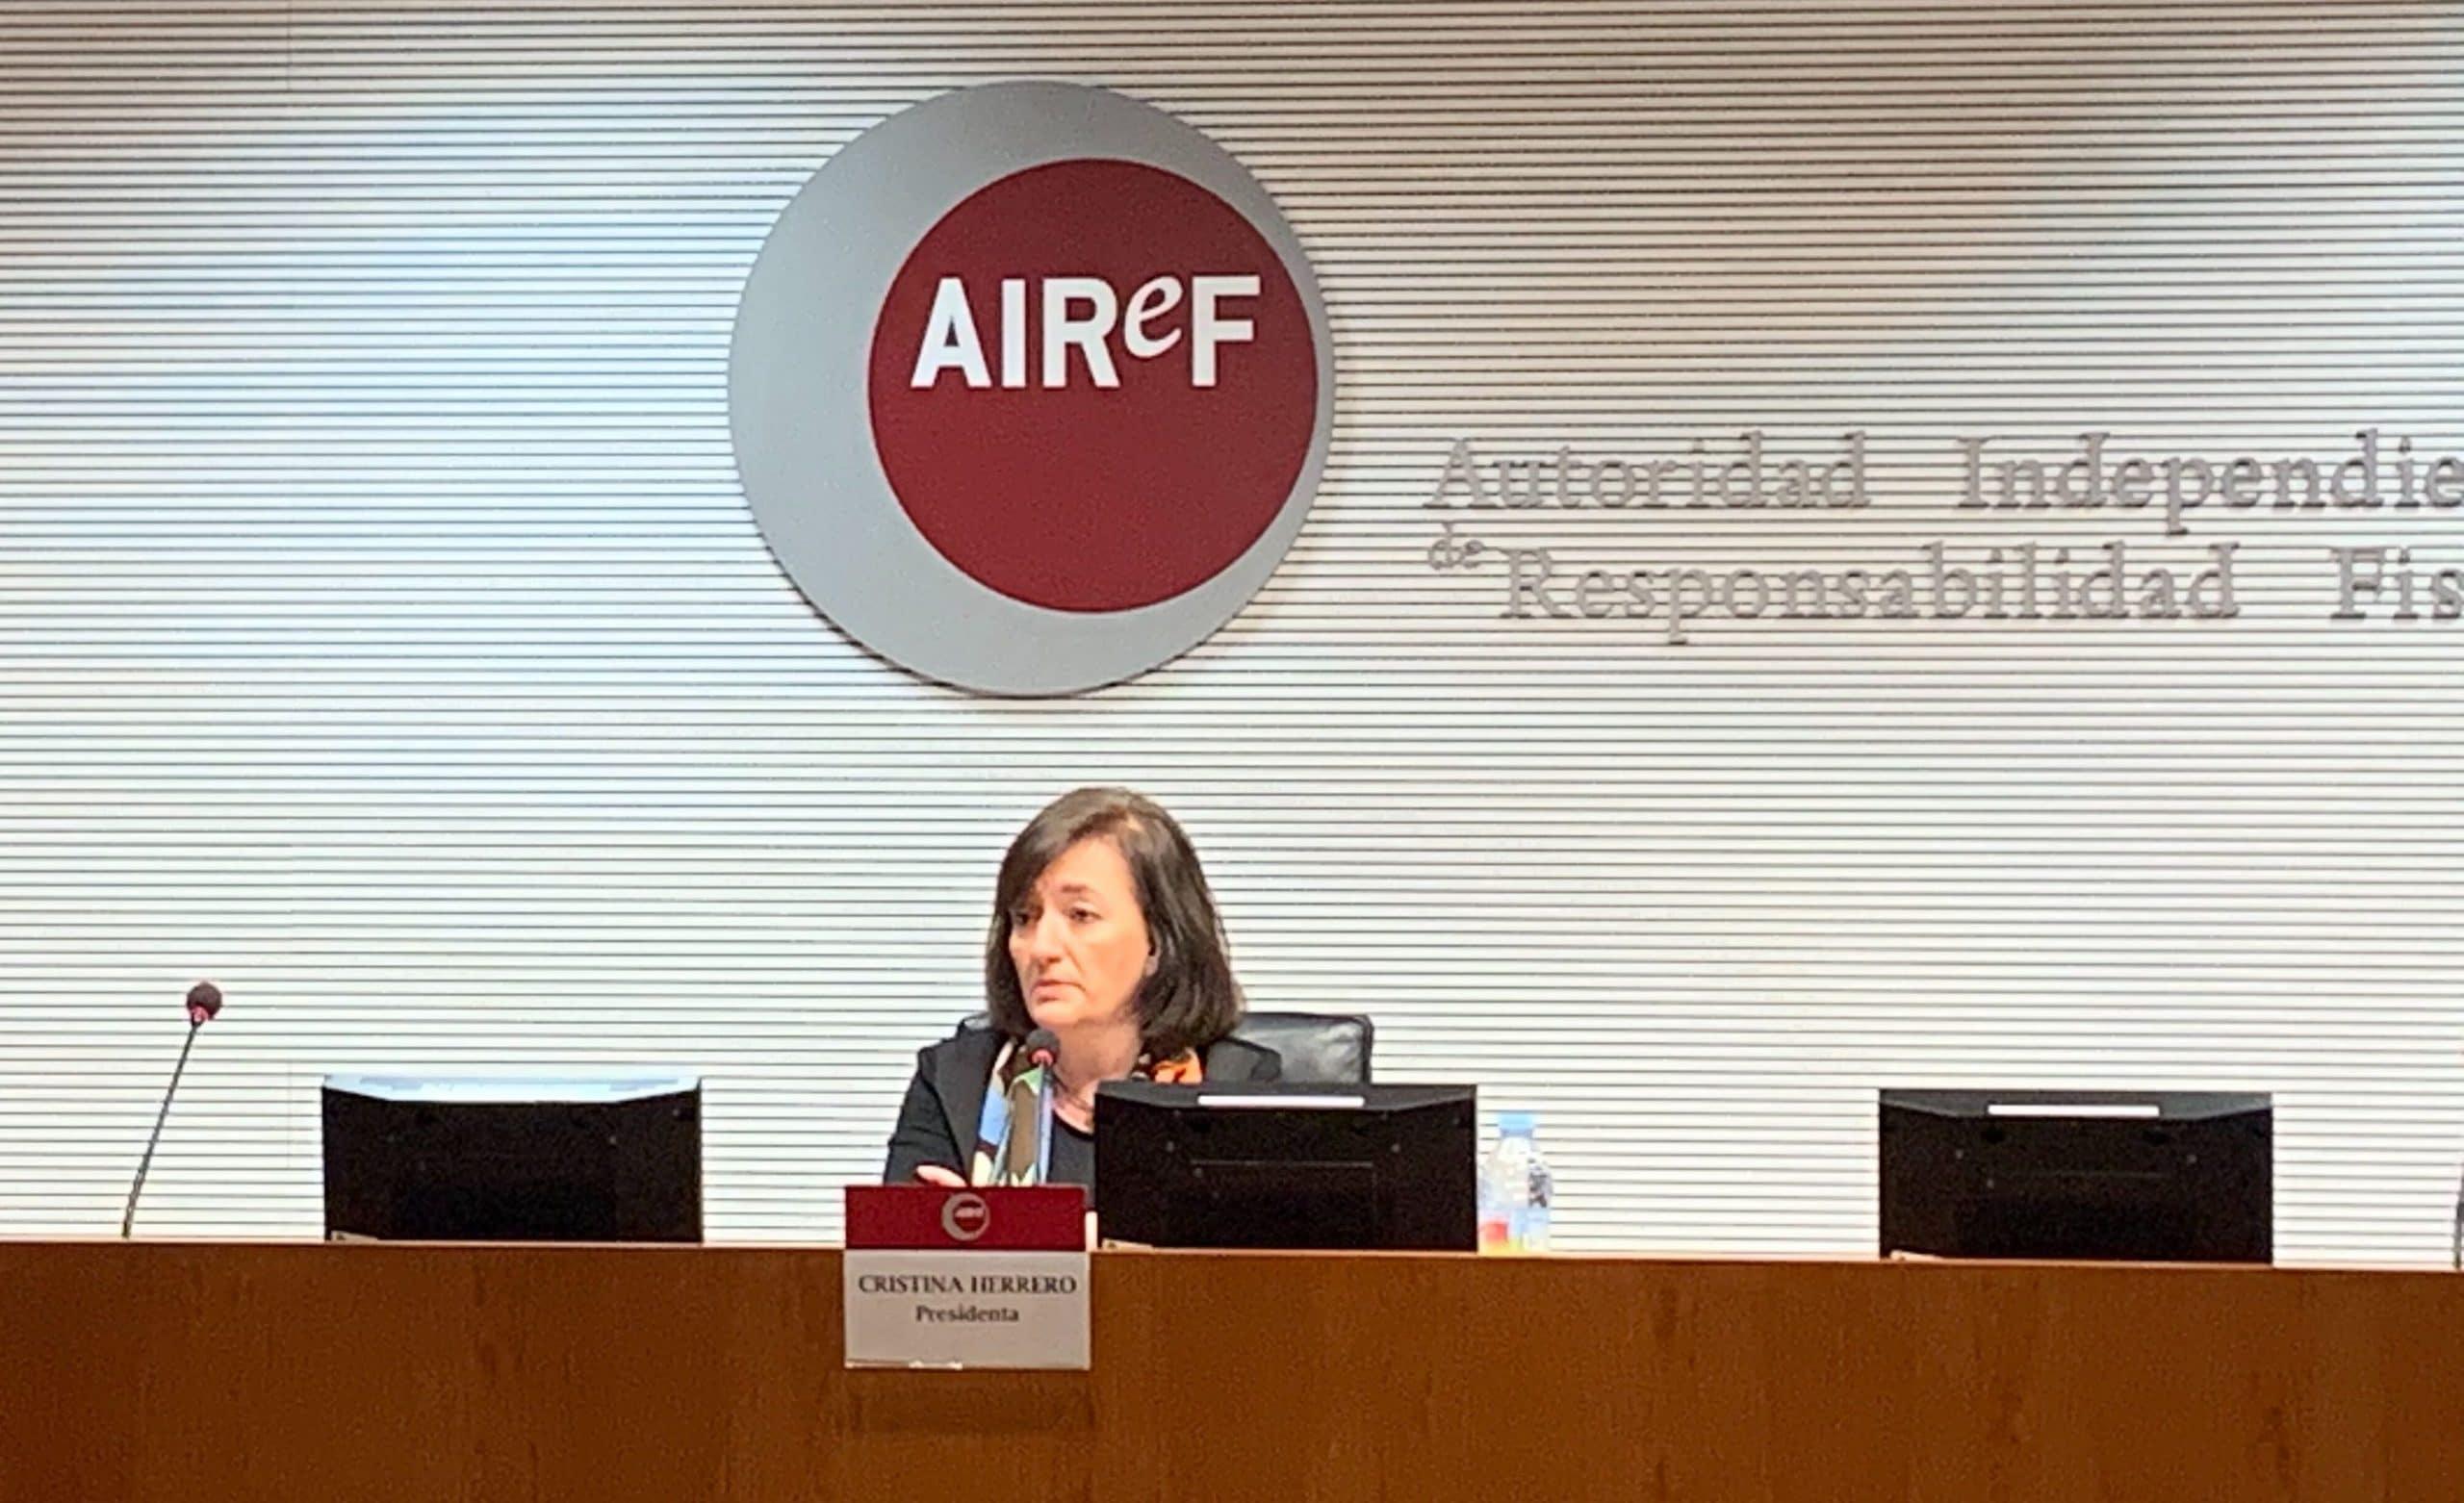 Cristina Herrero presenta el informe APE en lal AIREF